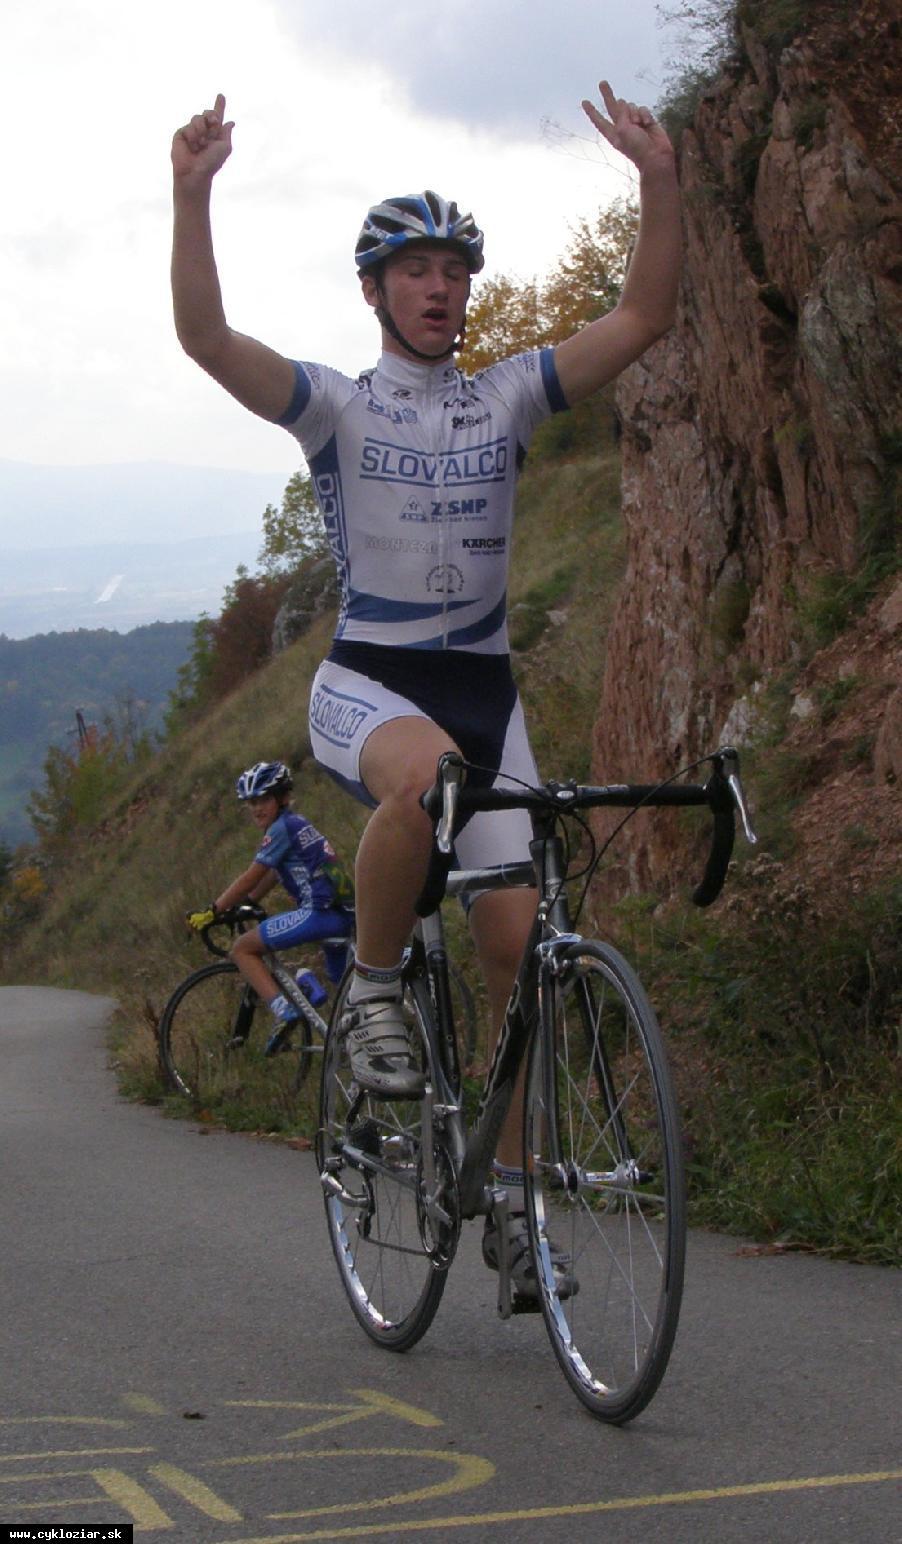 obr: Cyklisti Procner a Bališ Majstrami republiky